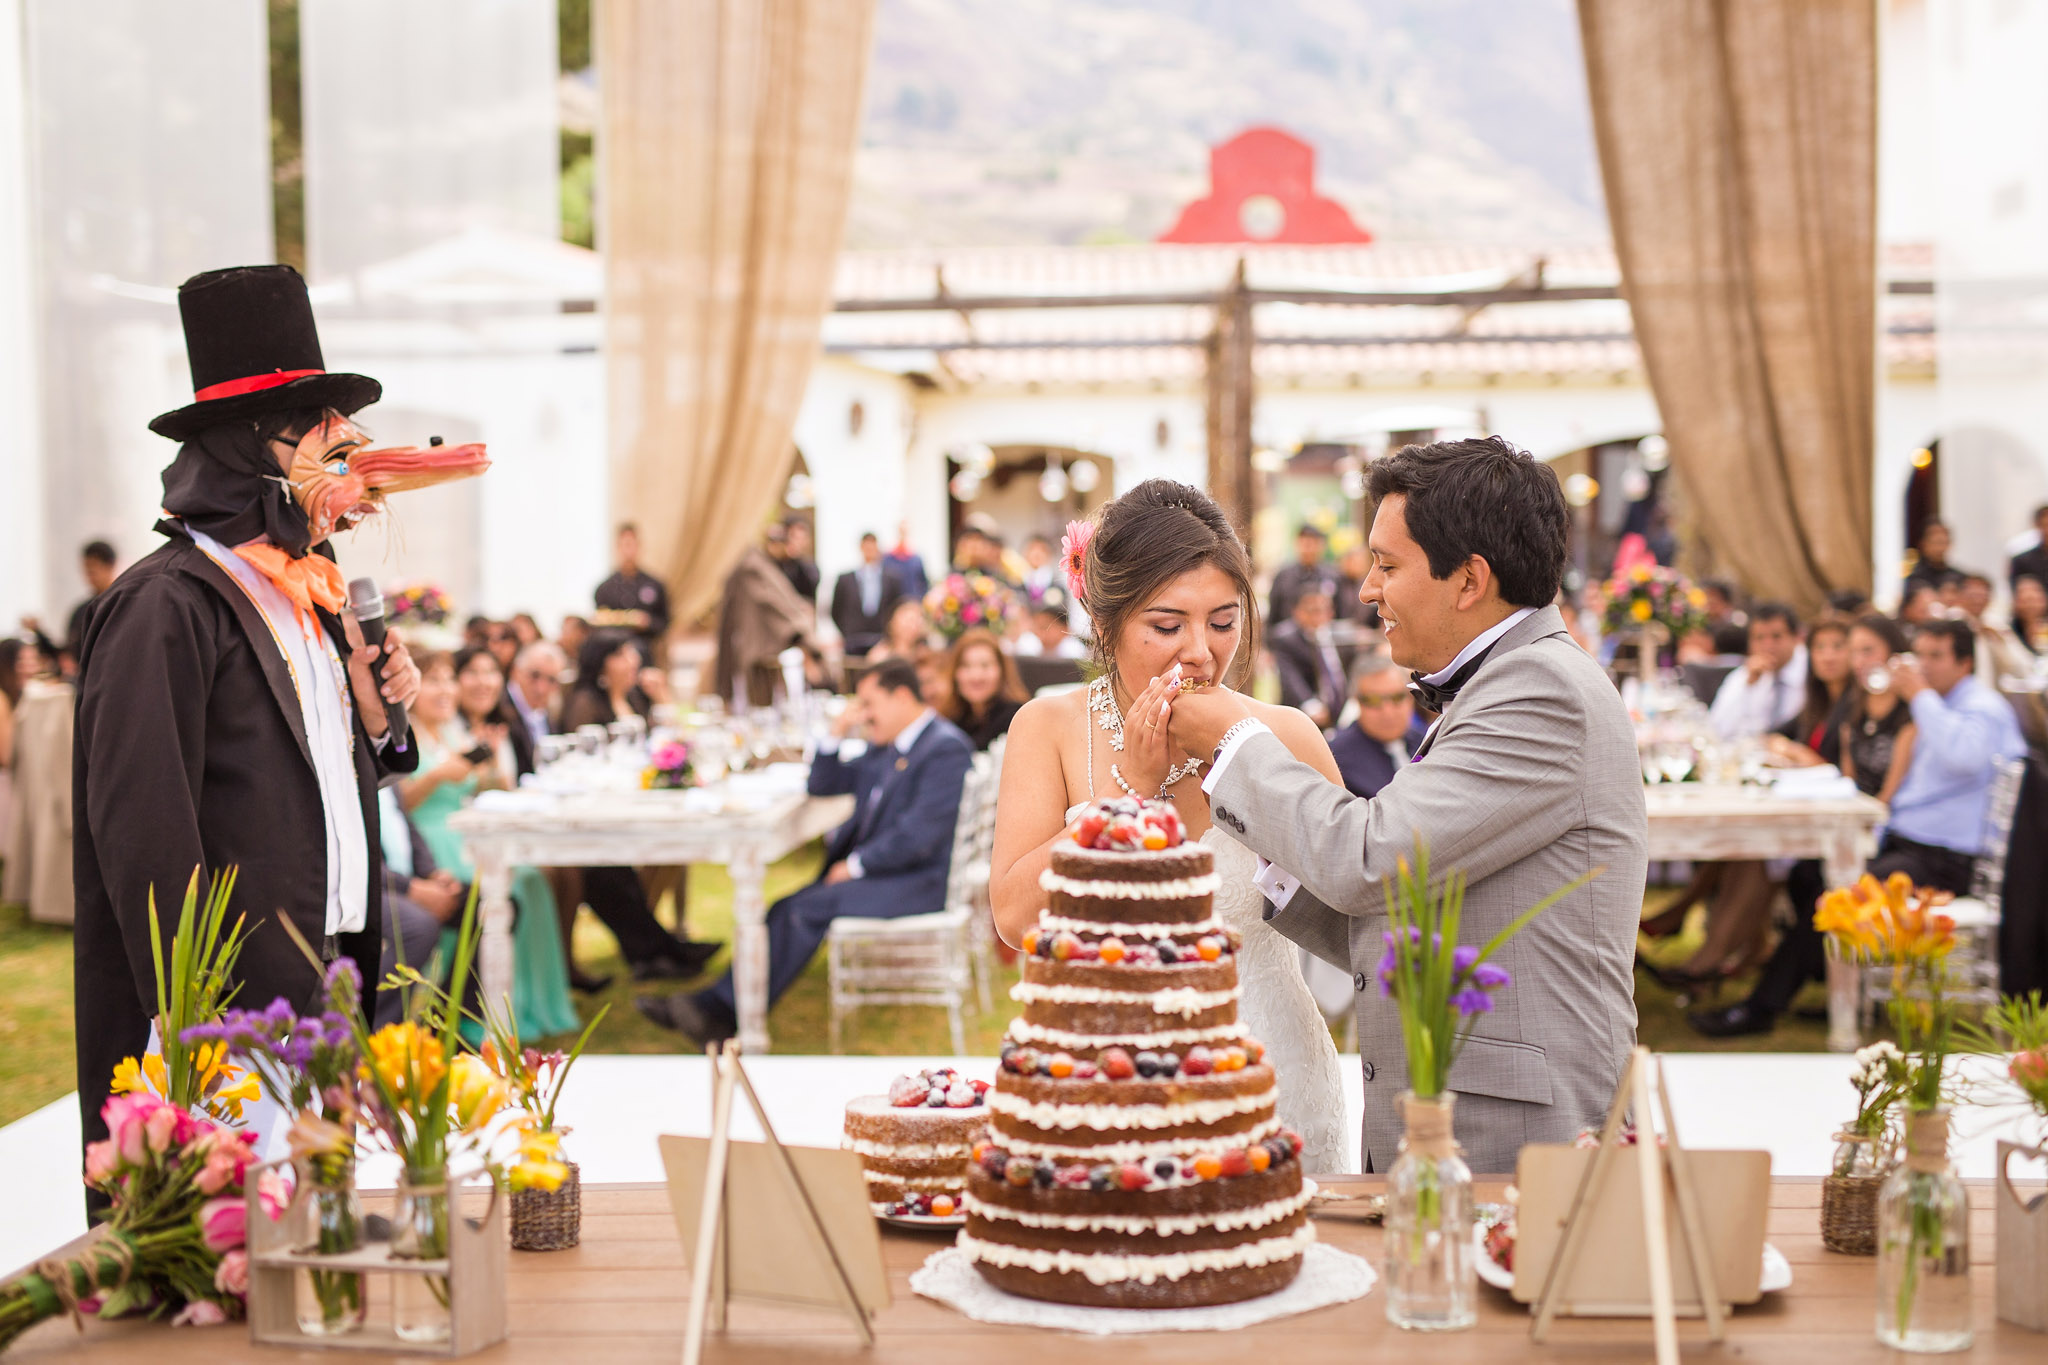 Wedding-Travellers-Destination-Wedding-Peru-Cusco-Hacienda-Sarapampa-Sacred-Valley-cake-cutting